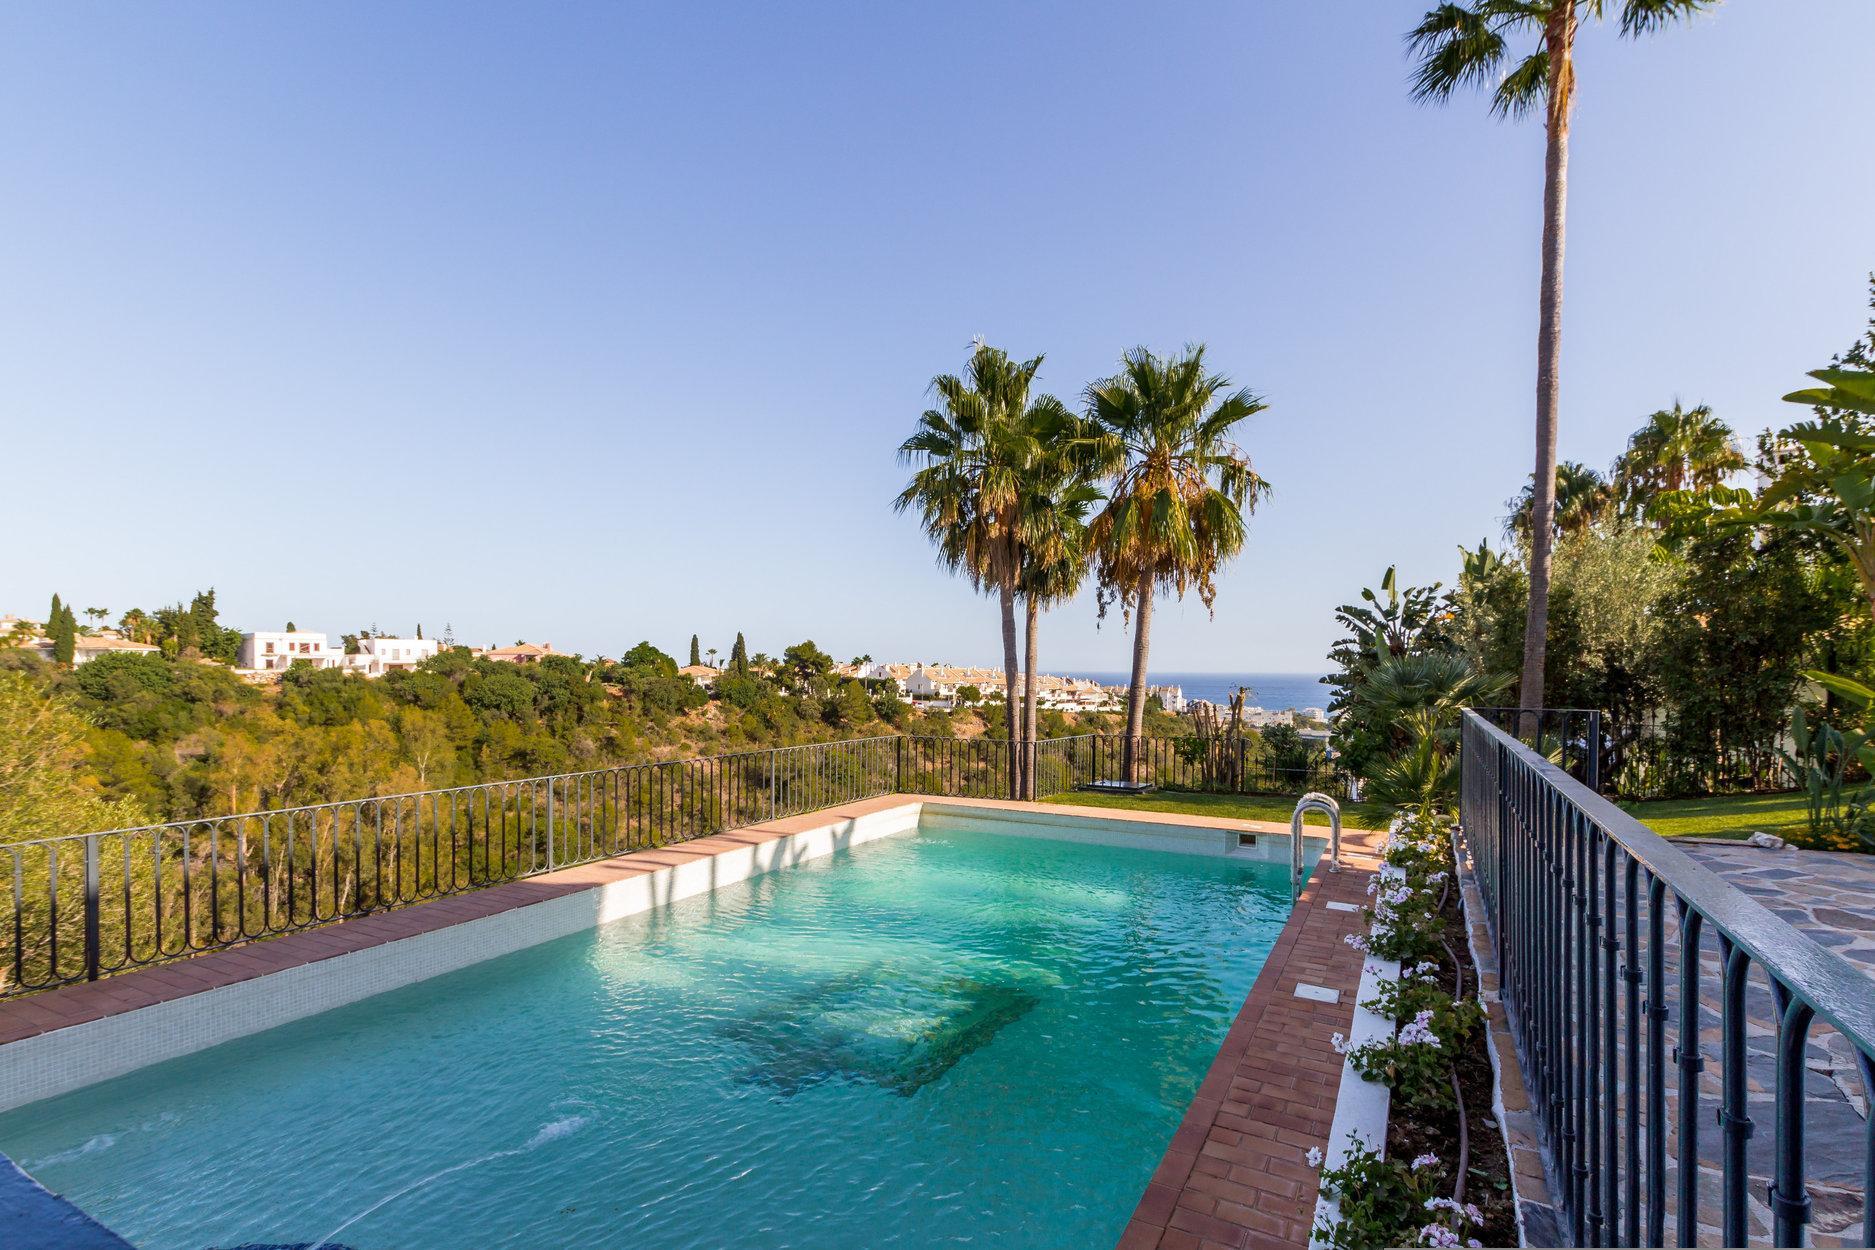 Villa Monte Paraiso Golf & Country Club Marbella Golden Mile, Marbella